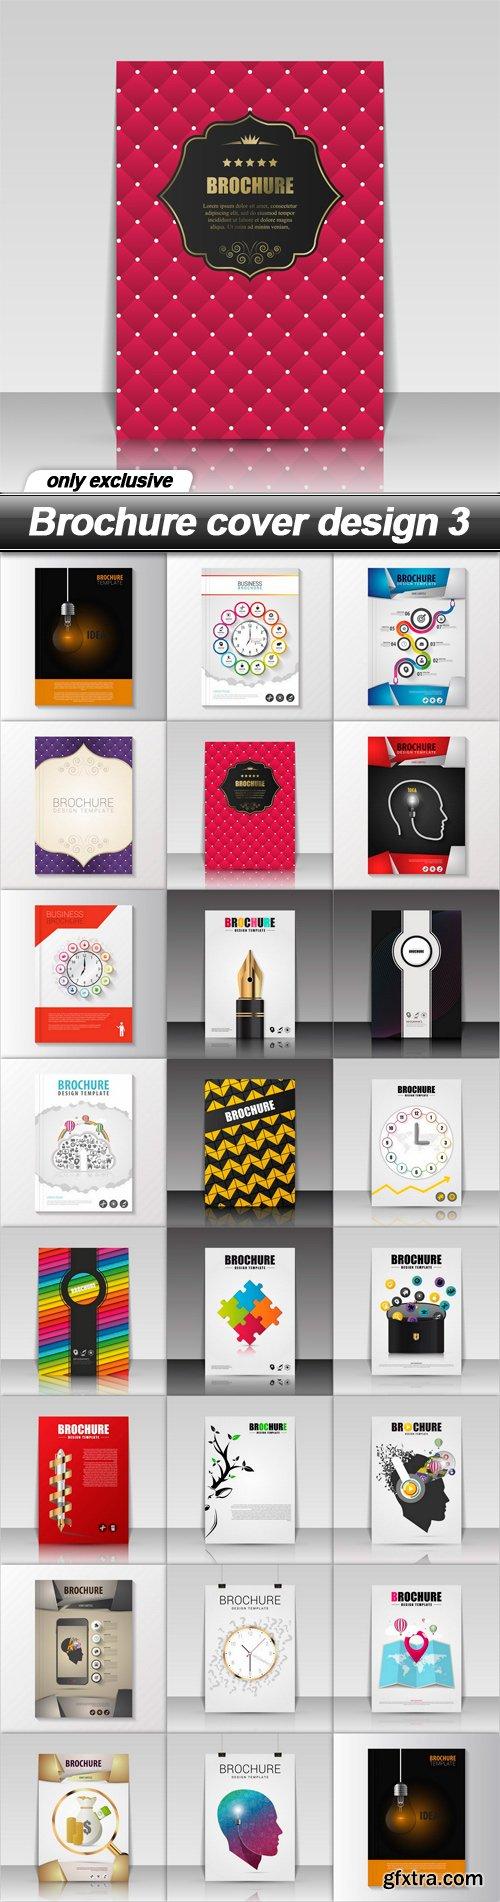 Brochure cover design 3 - 23 EPS